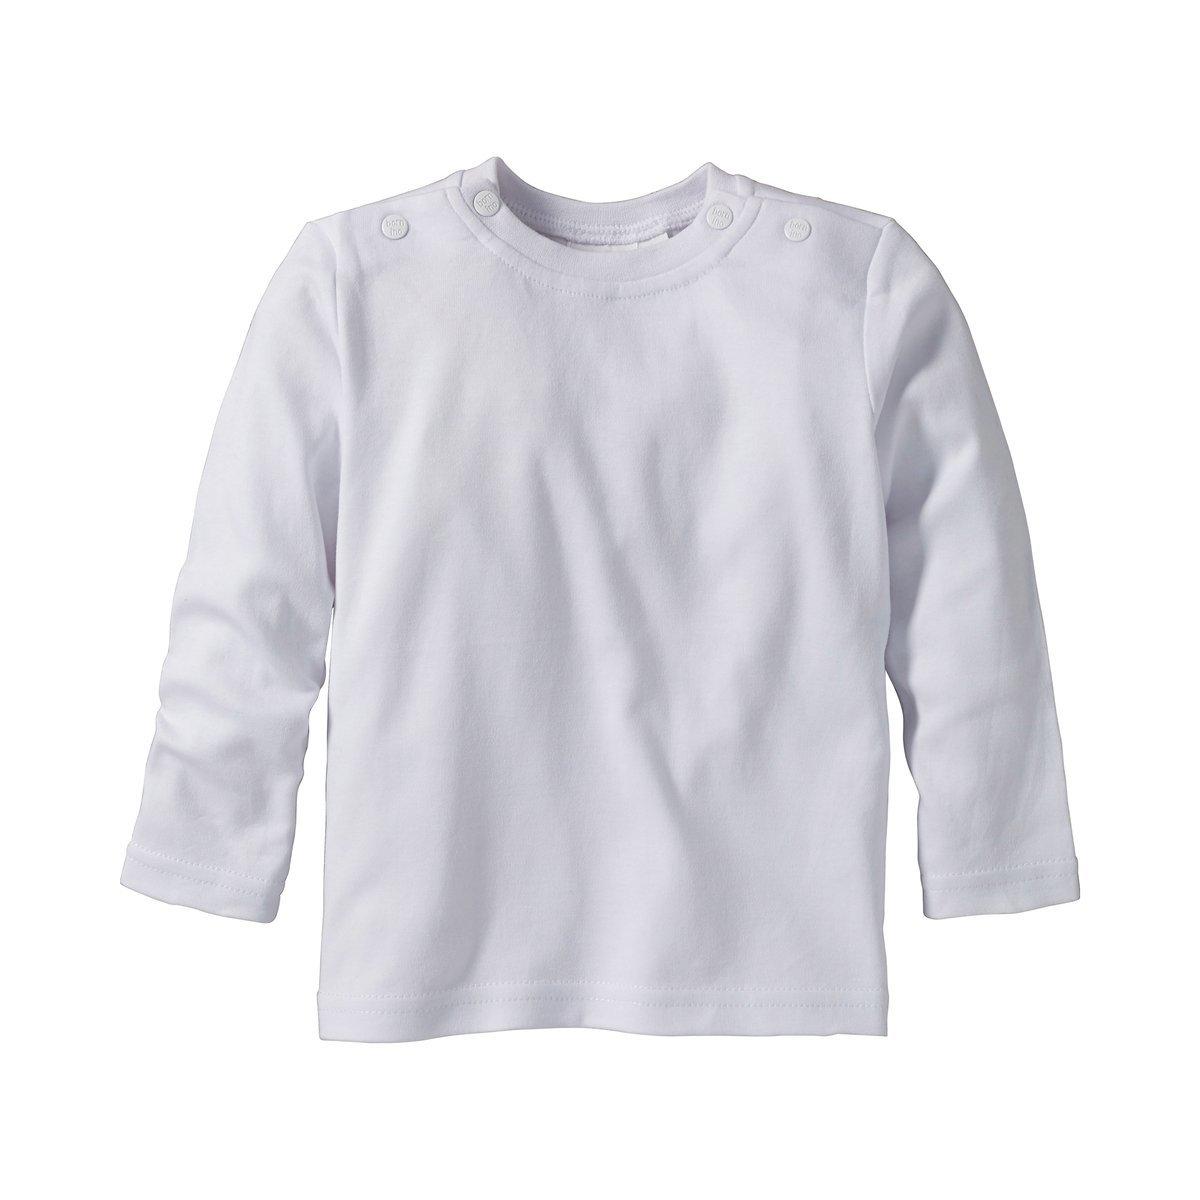 Baumwoll-Longsleeve mit Rundhalsausschnitt /& Druckkn/öpfen an den Schultern Bornino Shirt Langarm Langarmshirt f/ür Babys einfarbig